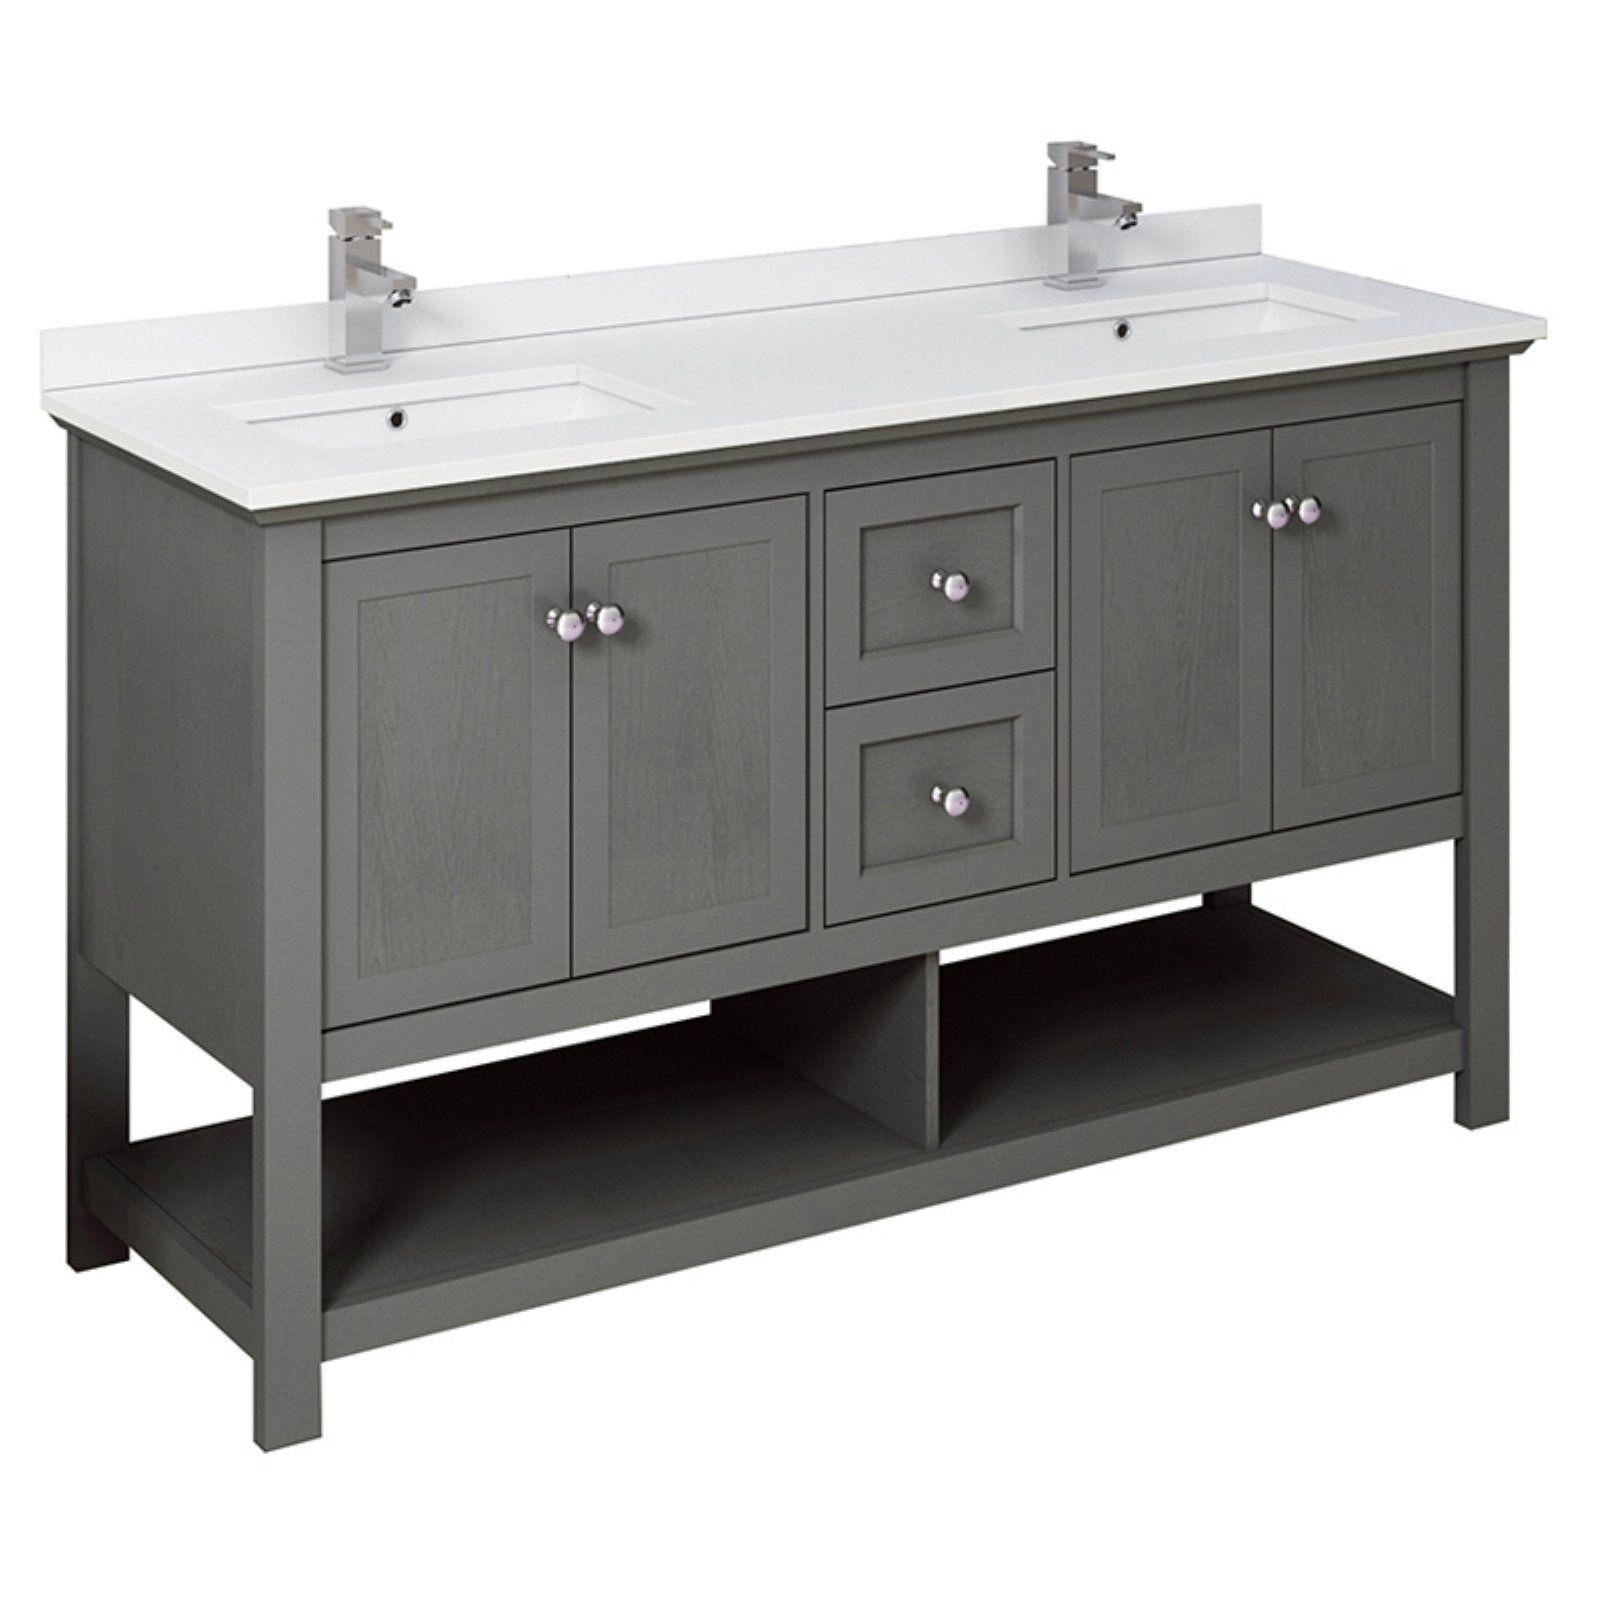 Wood Veneer Traditional Double Sink